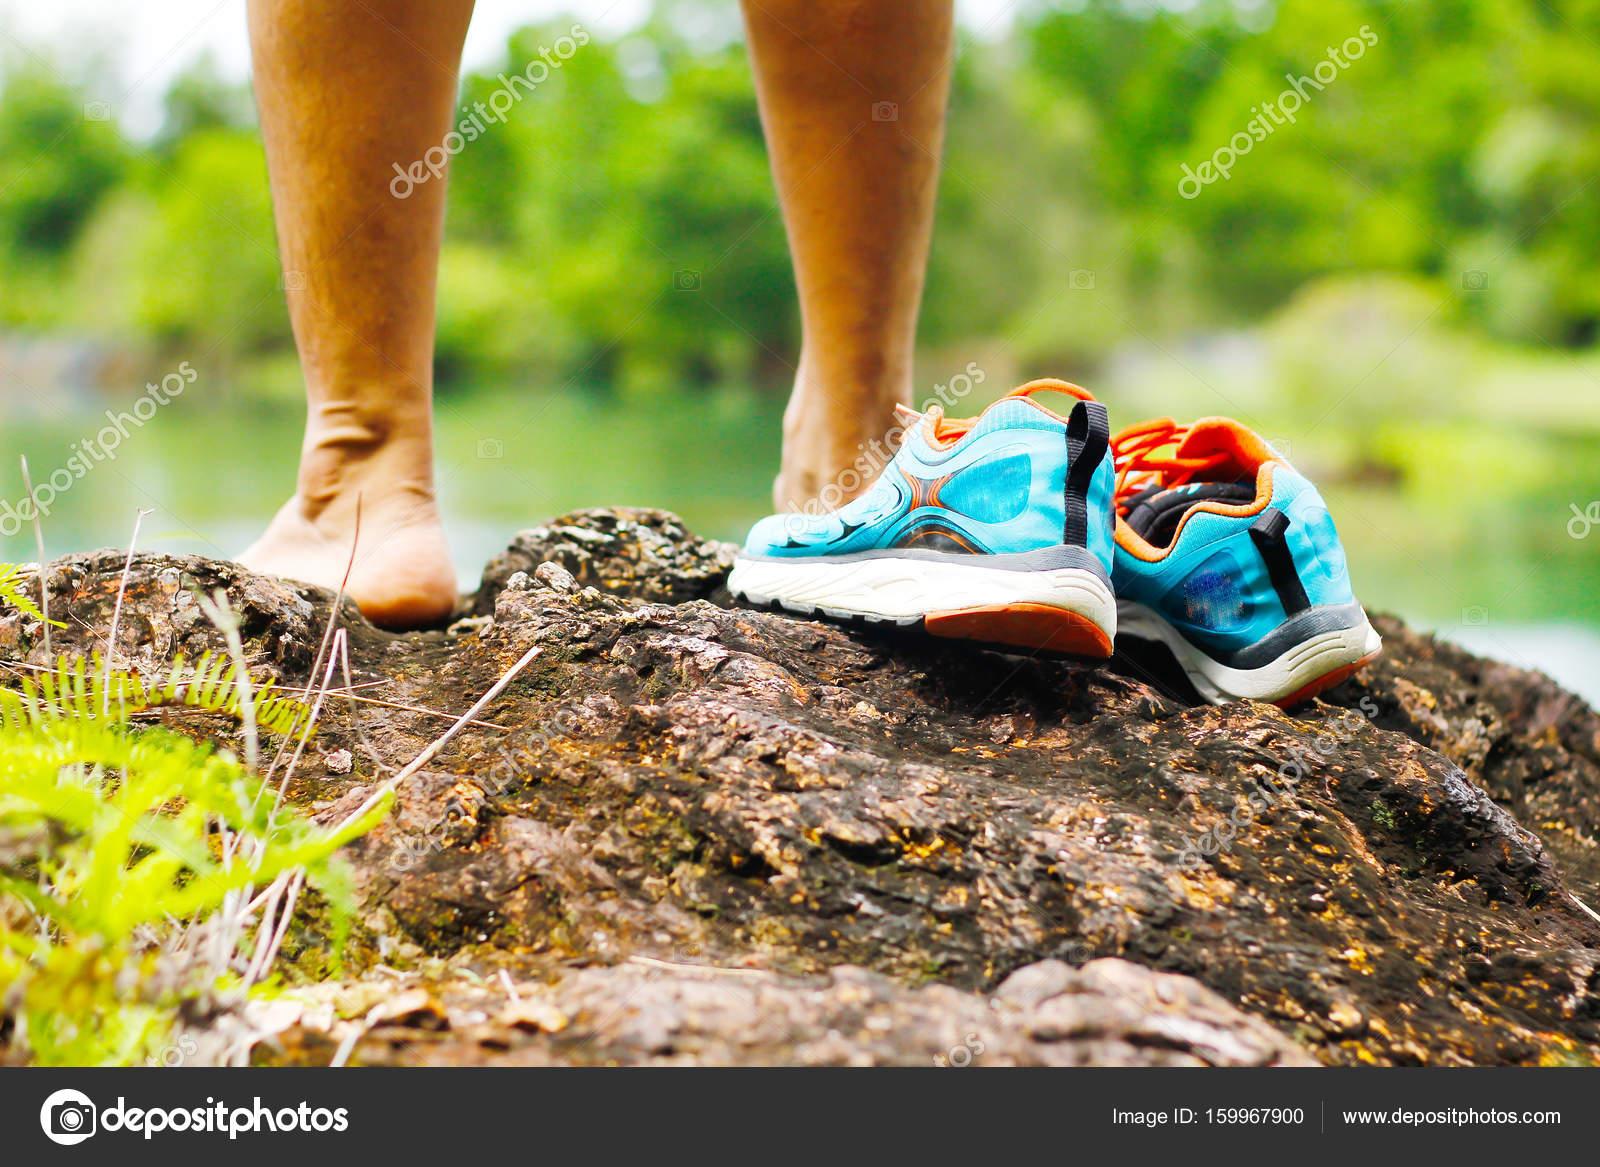 7d66c58d8e7 Στοκ φωτογραφία - παπούτσια στα βράχια δίπλα σε μια λίμνη στο βουνό —  Φωτογραφία Αρχείου